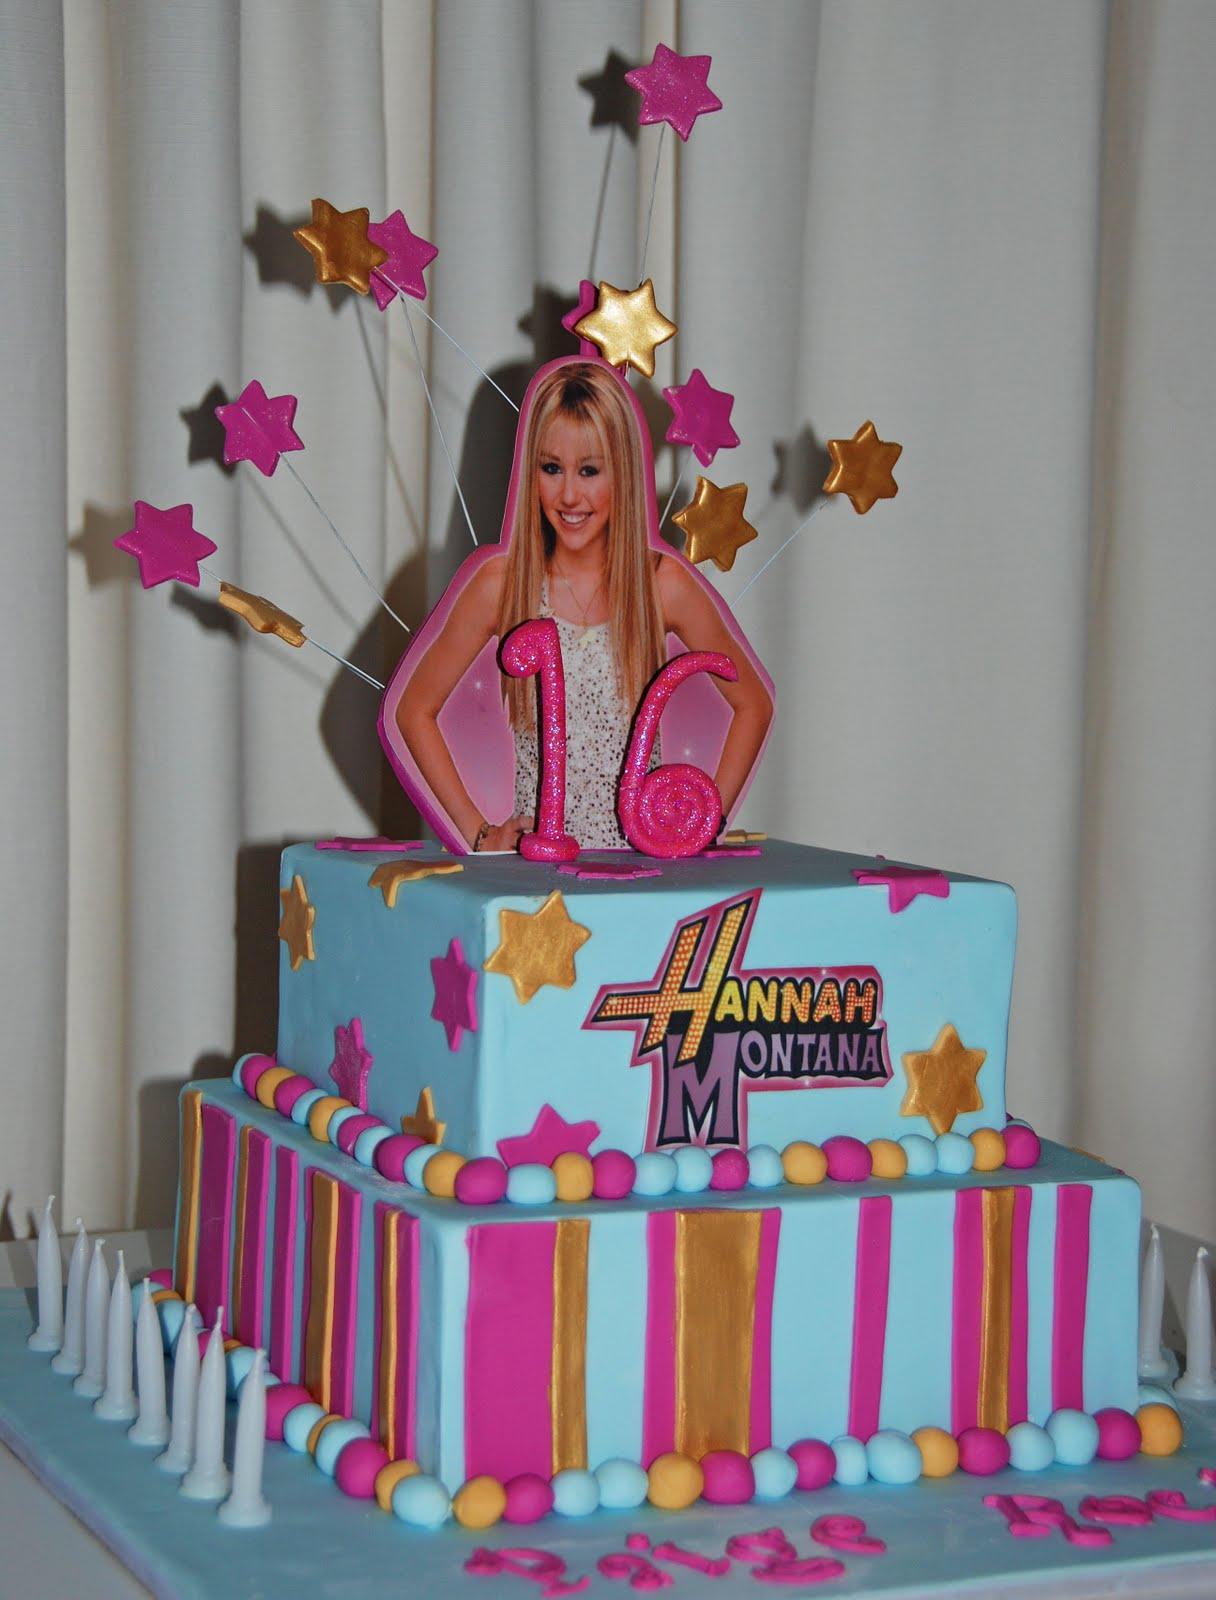 Little Robin Hannah Montana 16th Birthday Cake